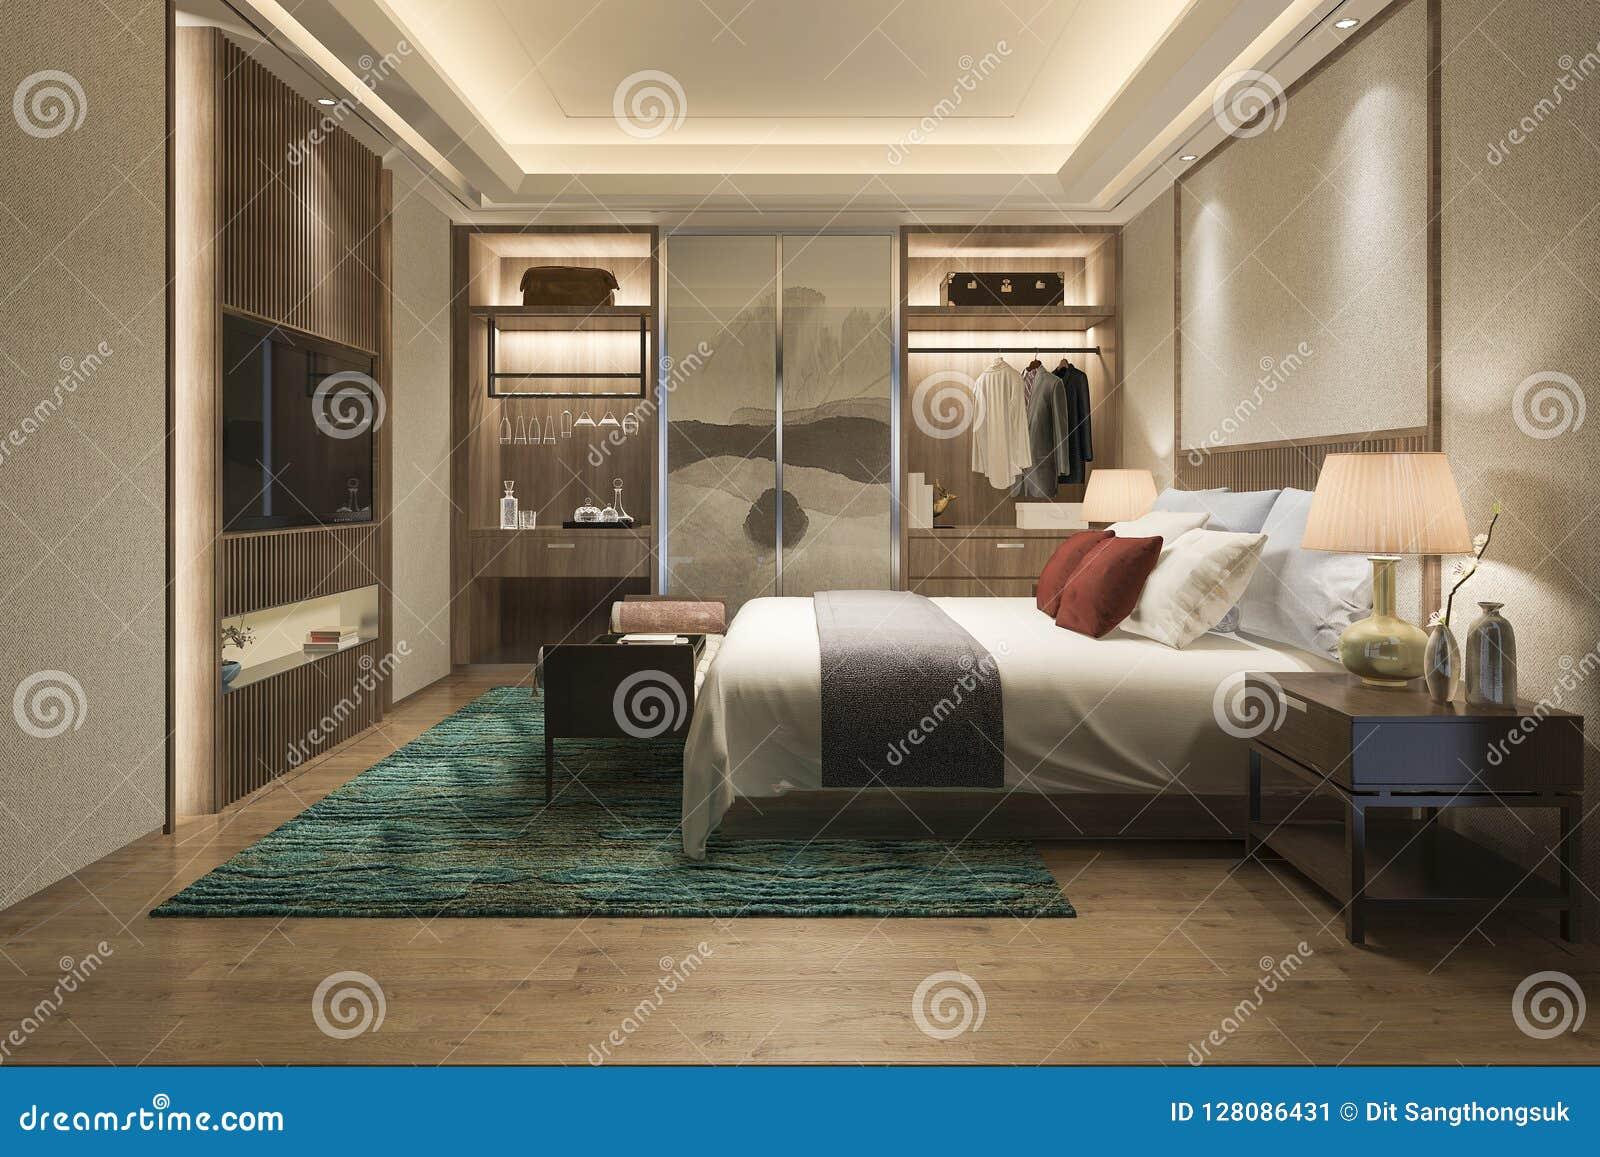 . 3d Rendering Luxury Modern Bedroom Suite Tv With Wardrobe And Walk